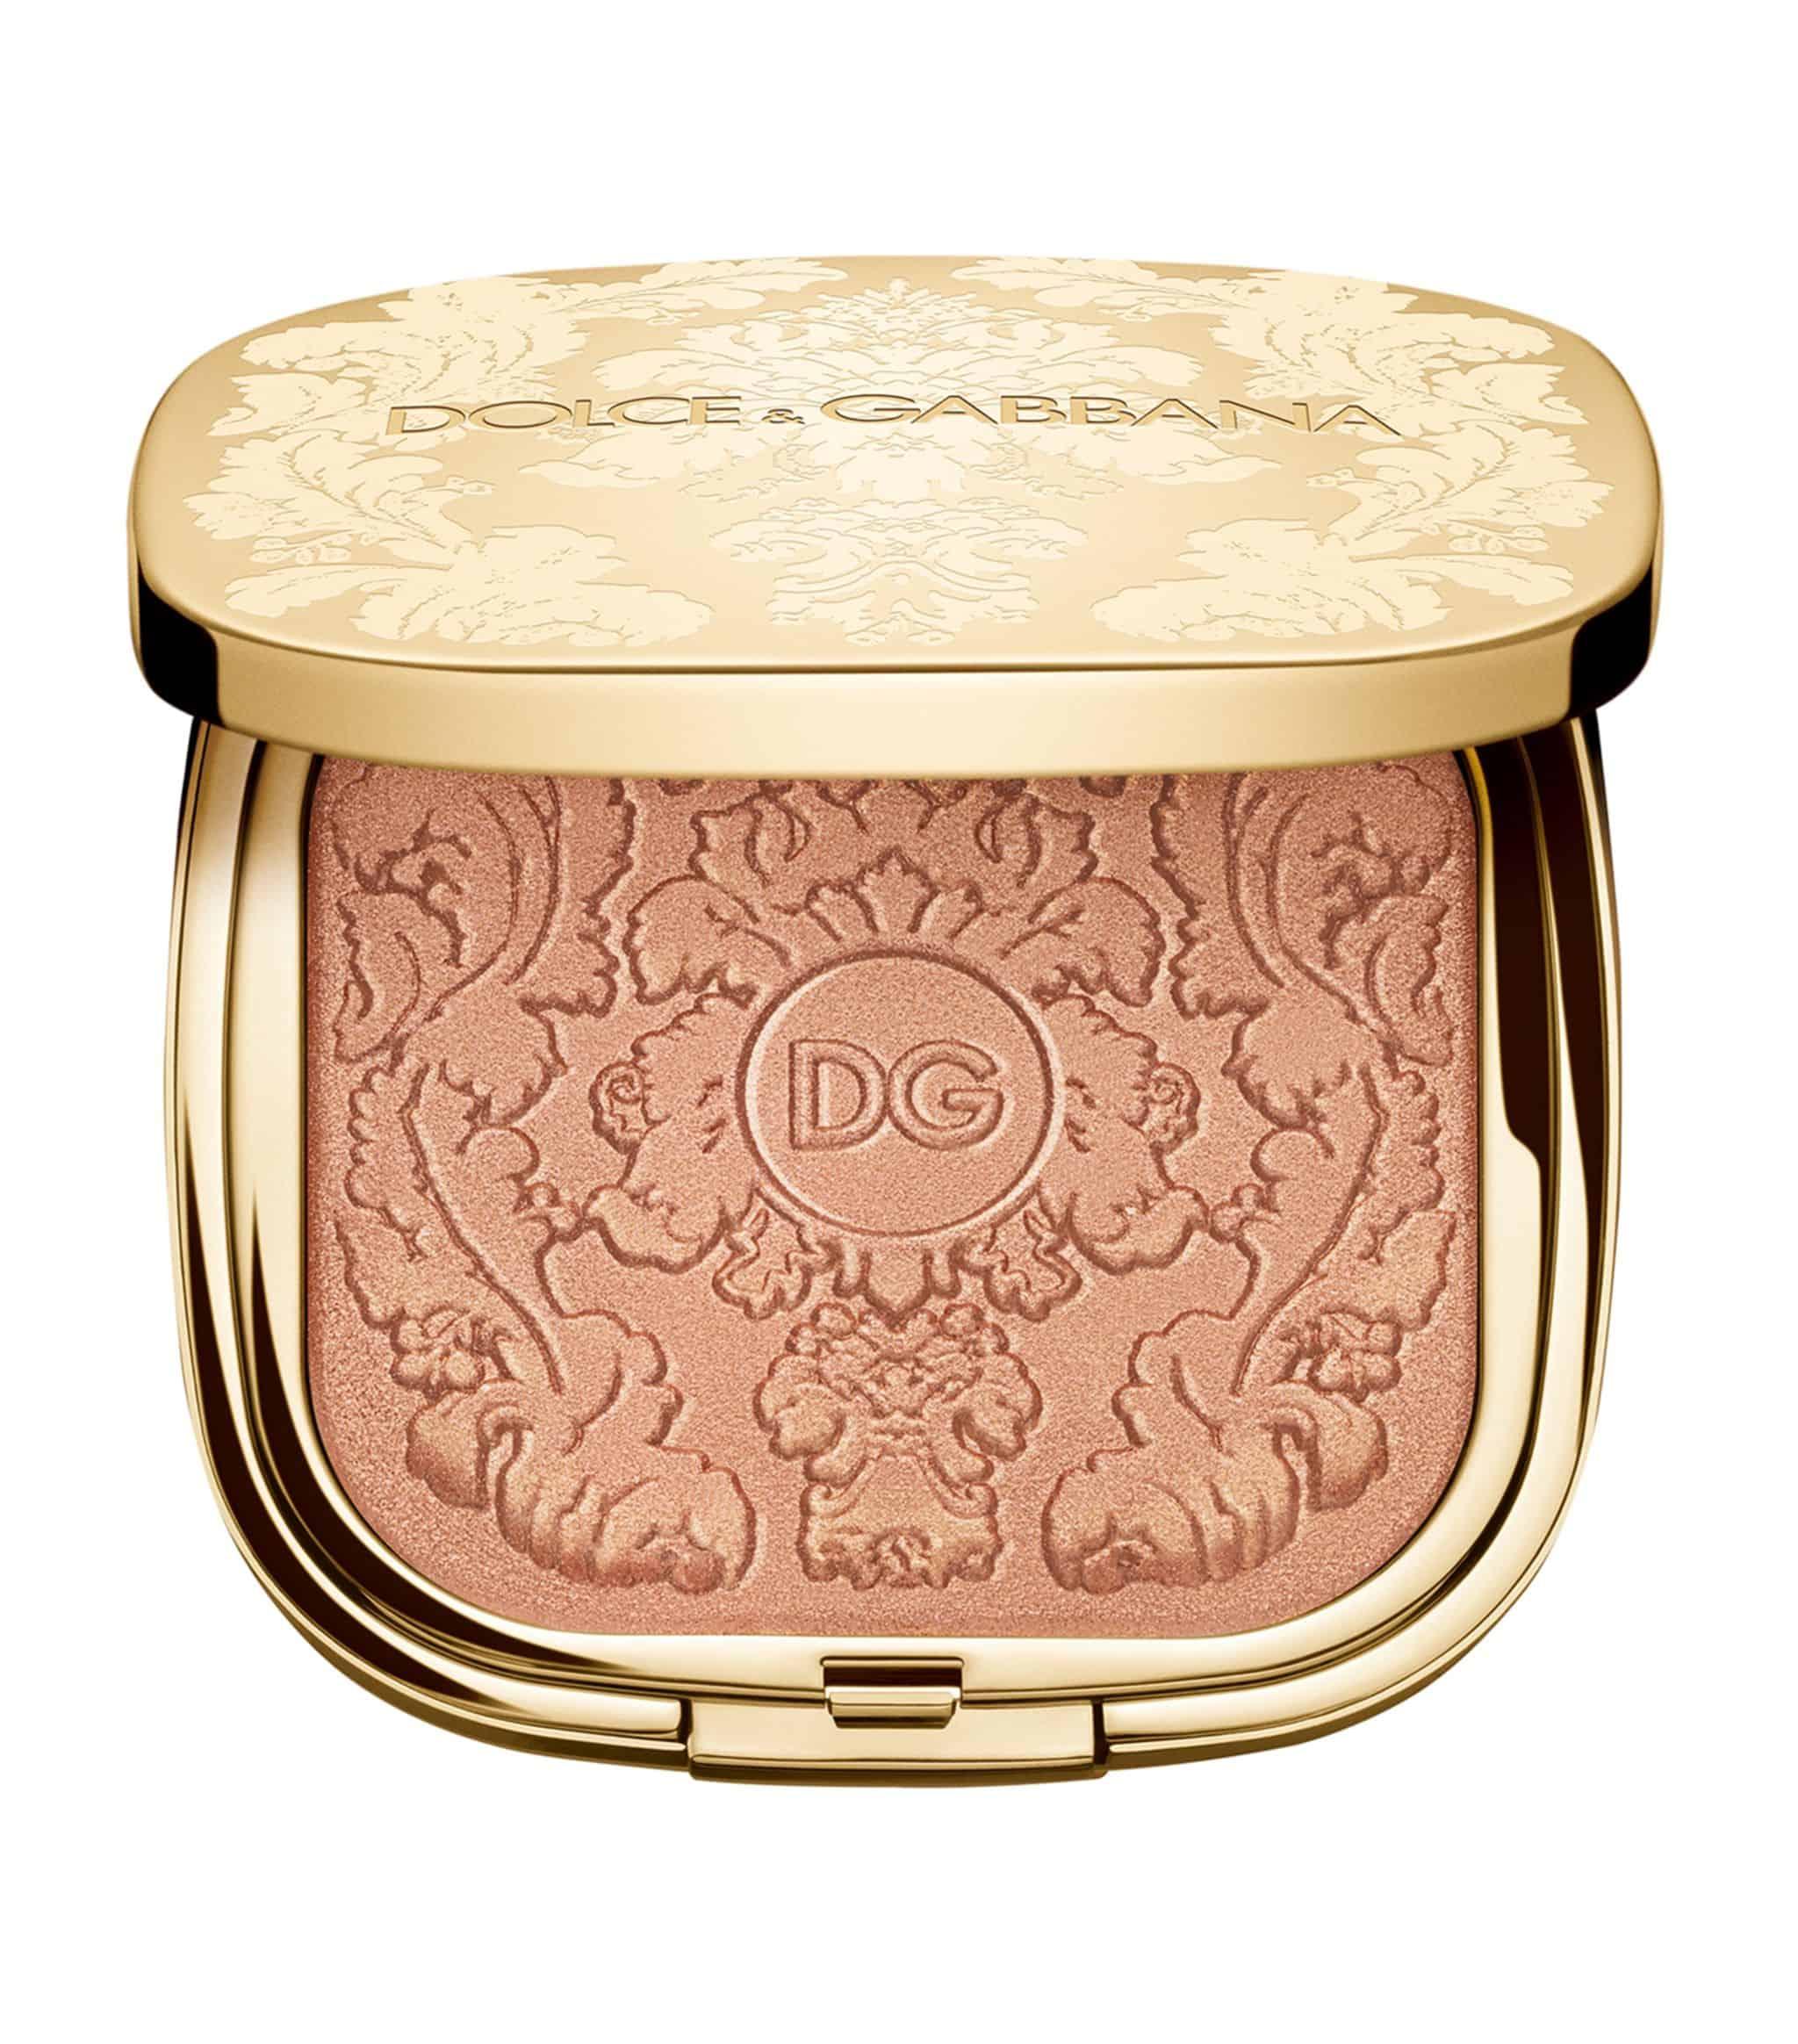 Dolce & Gabbana Baroque Lights Highlighting Powder